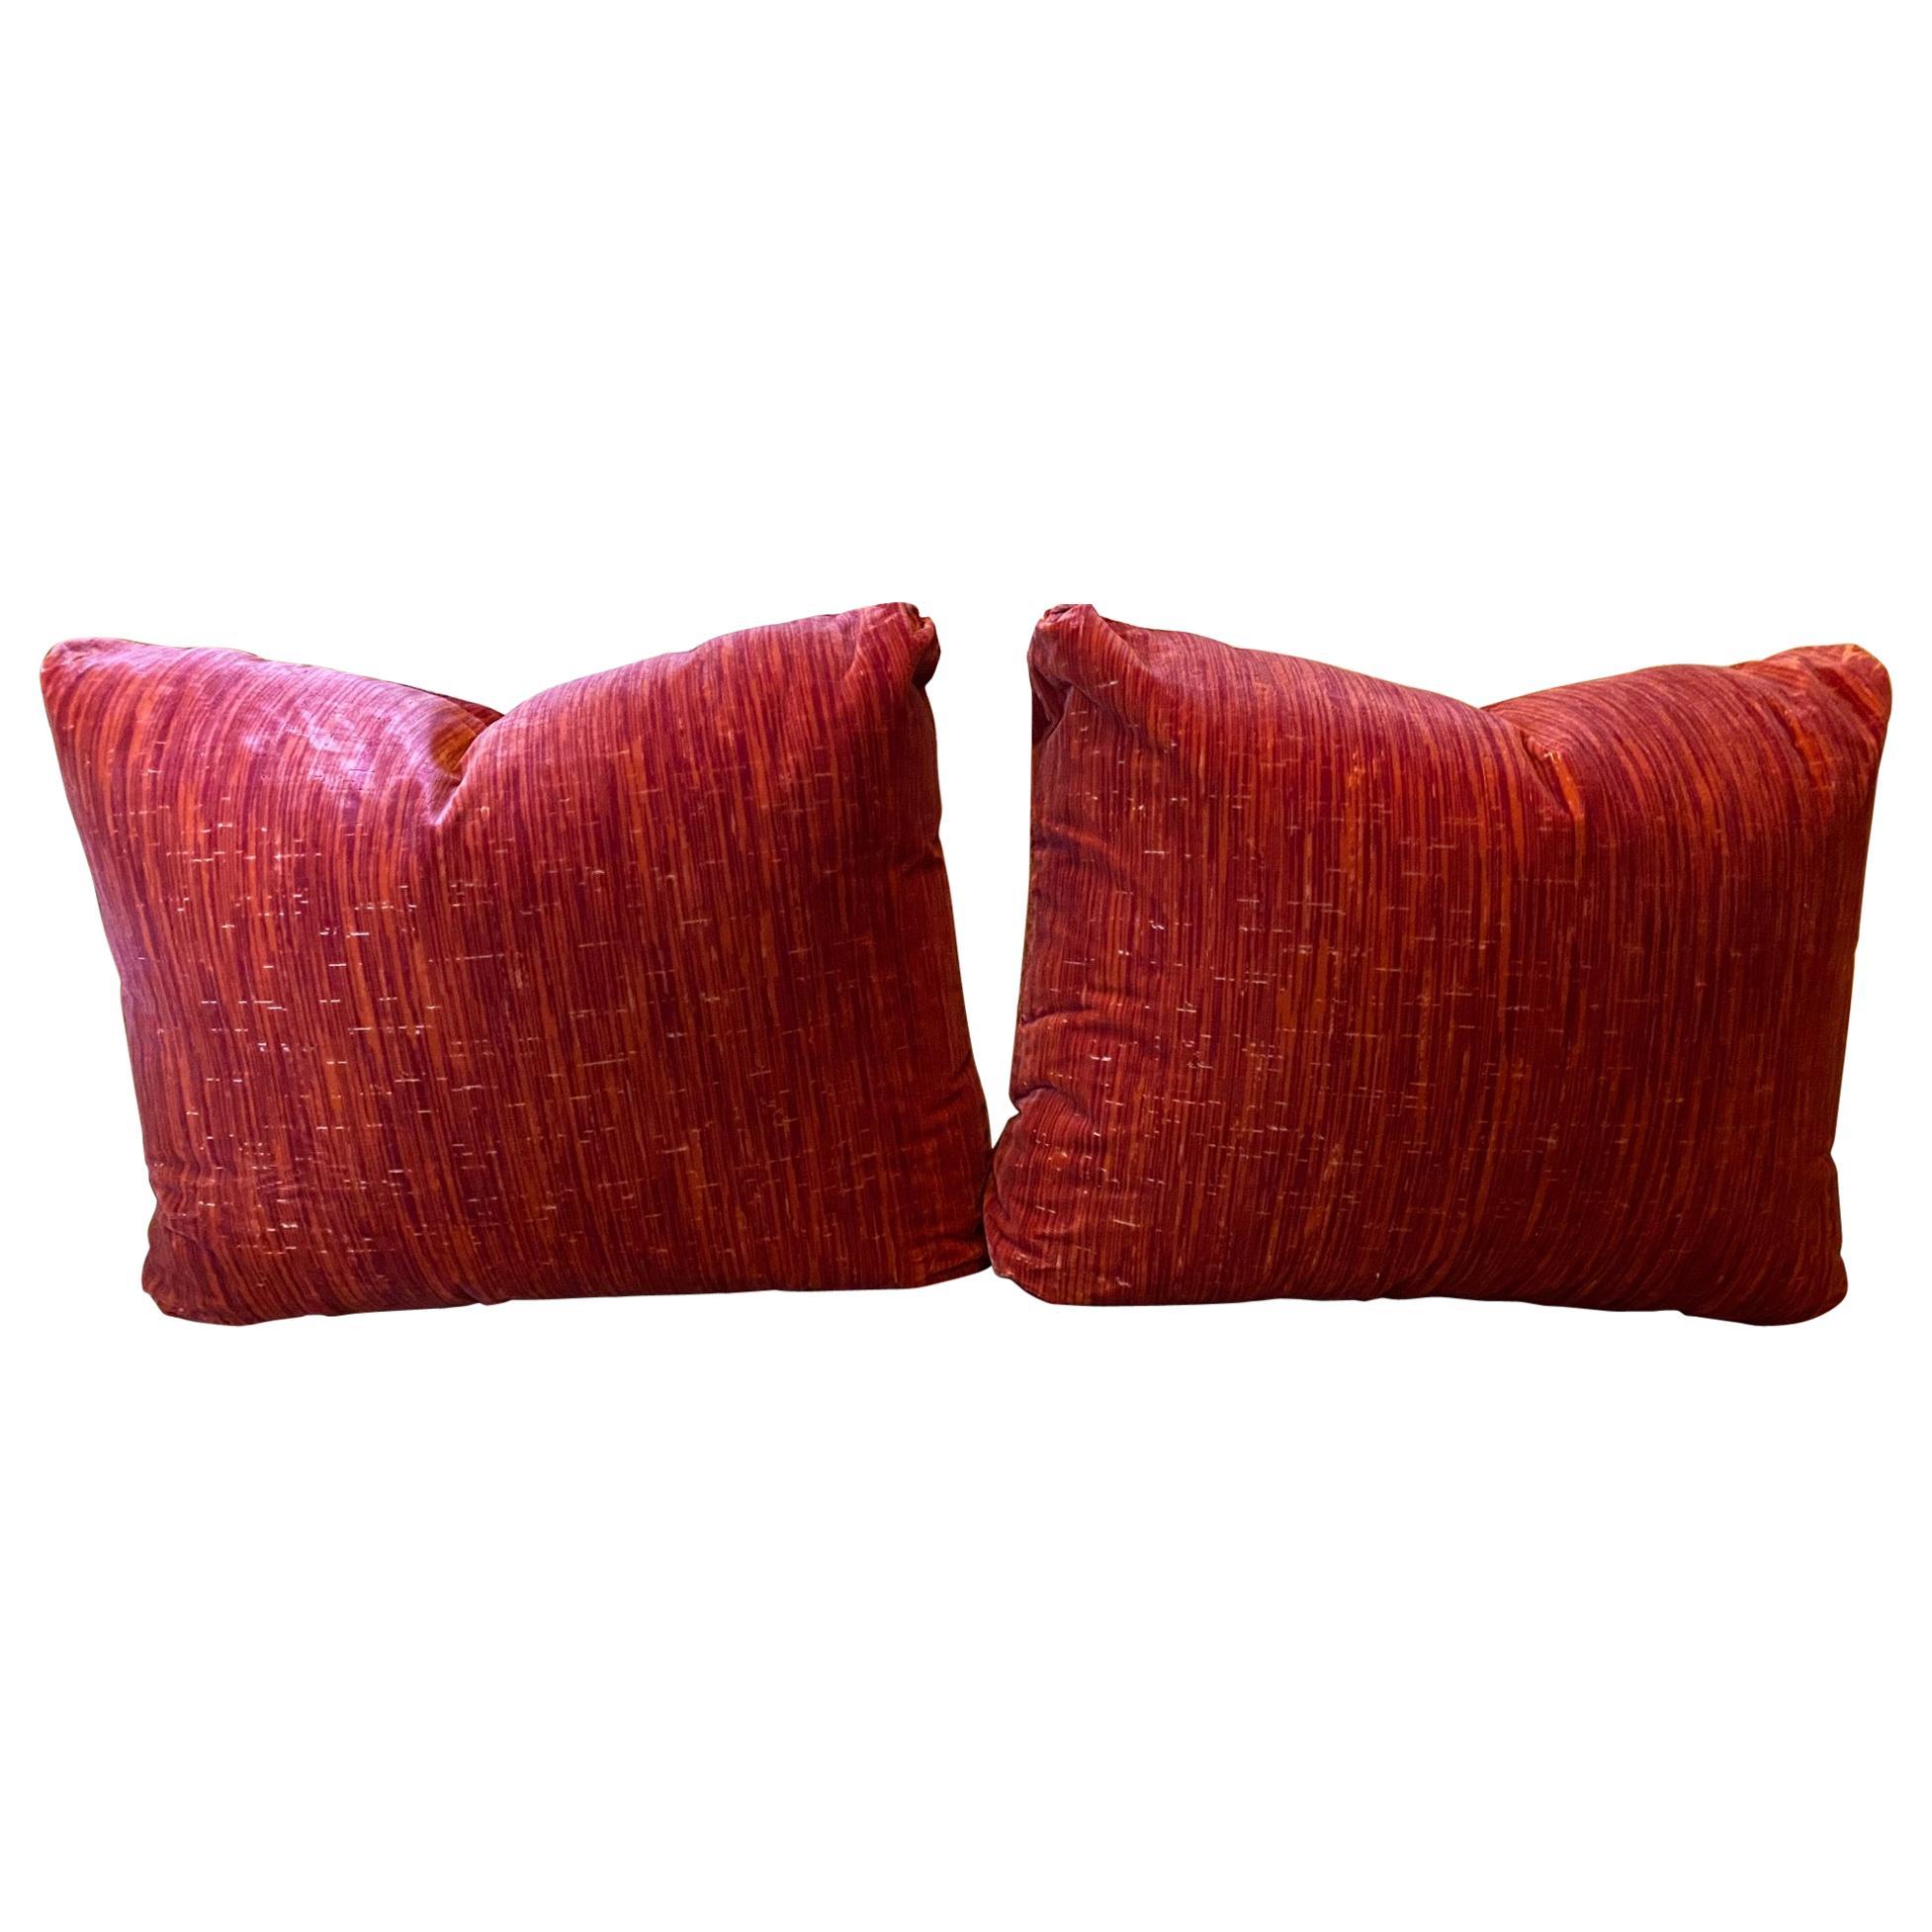 Large Pair of Red Strié Cut Velvet Cushions